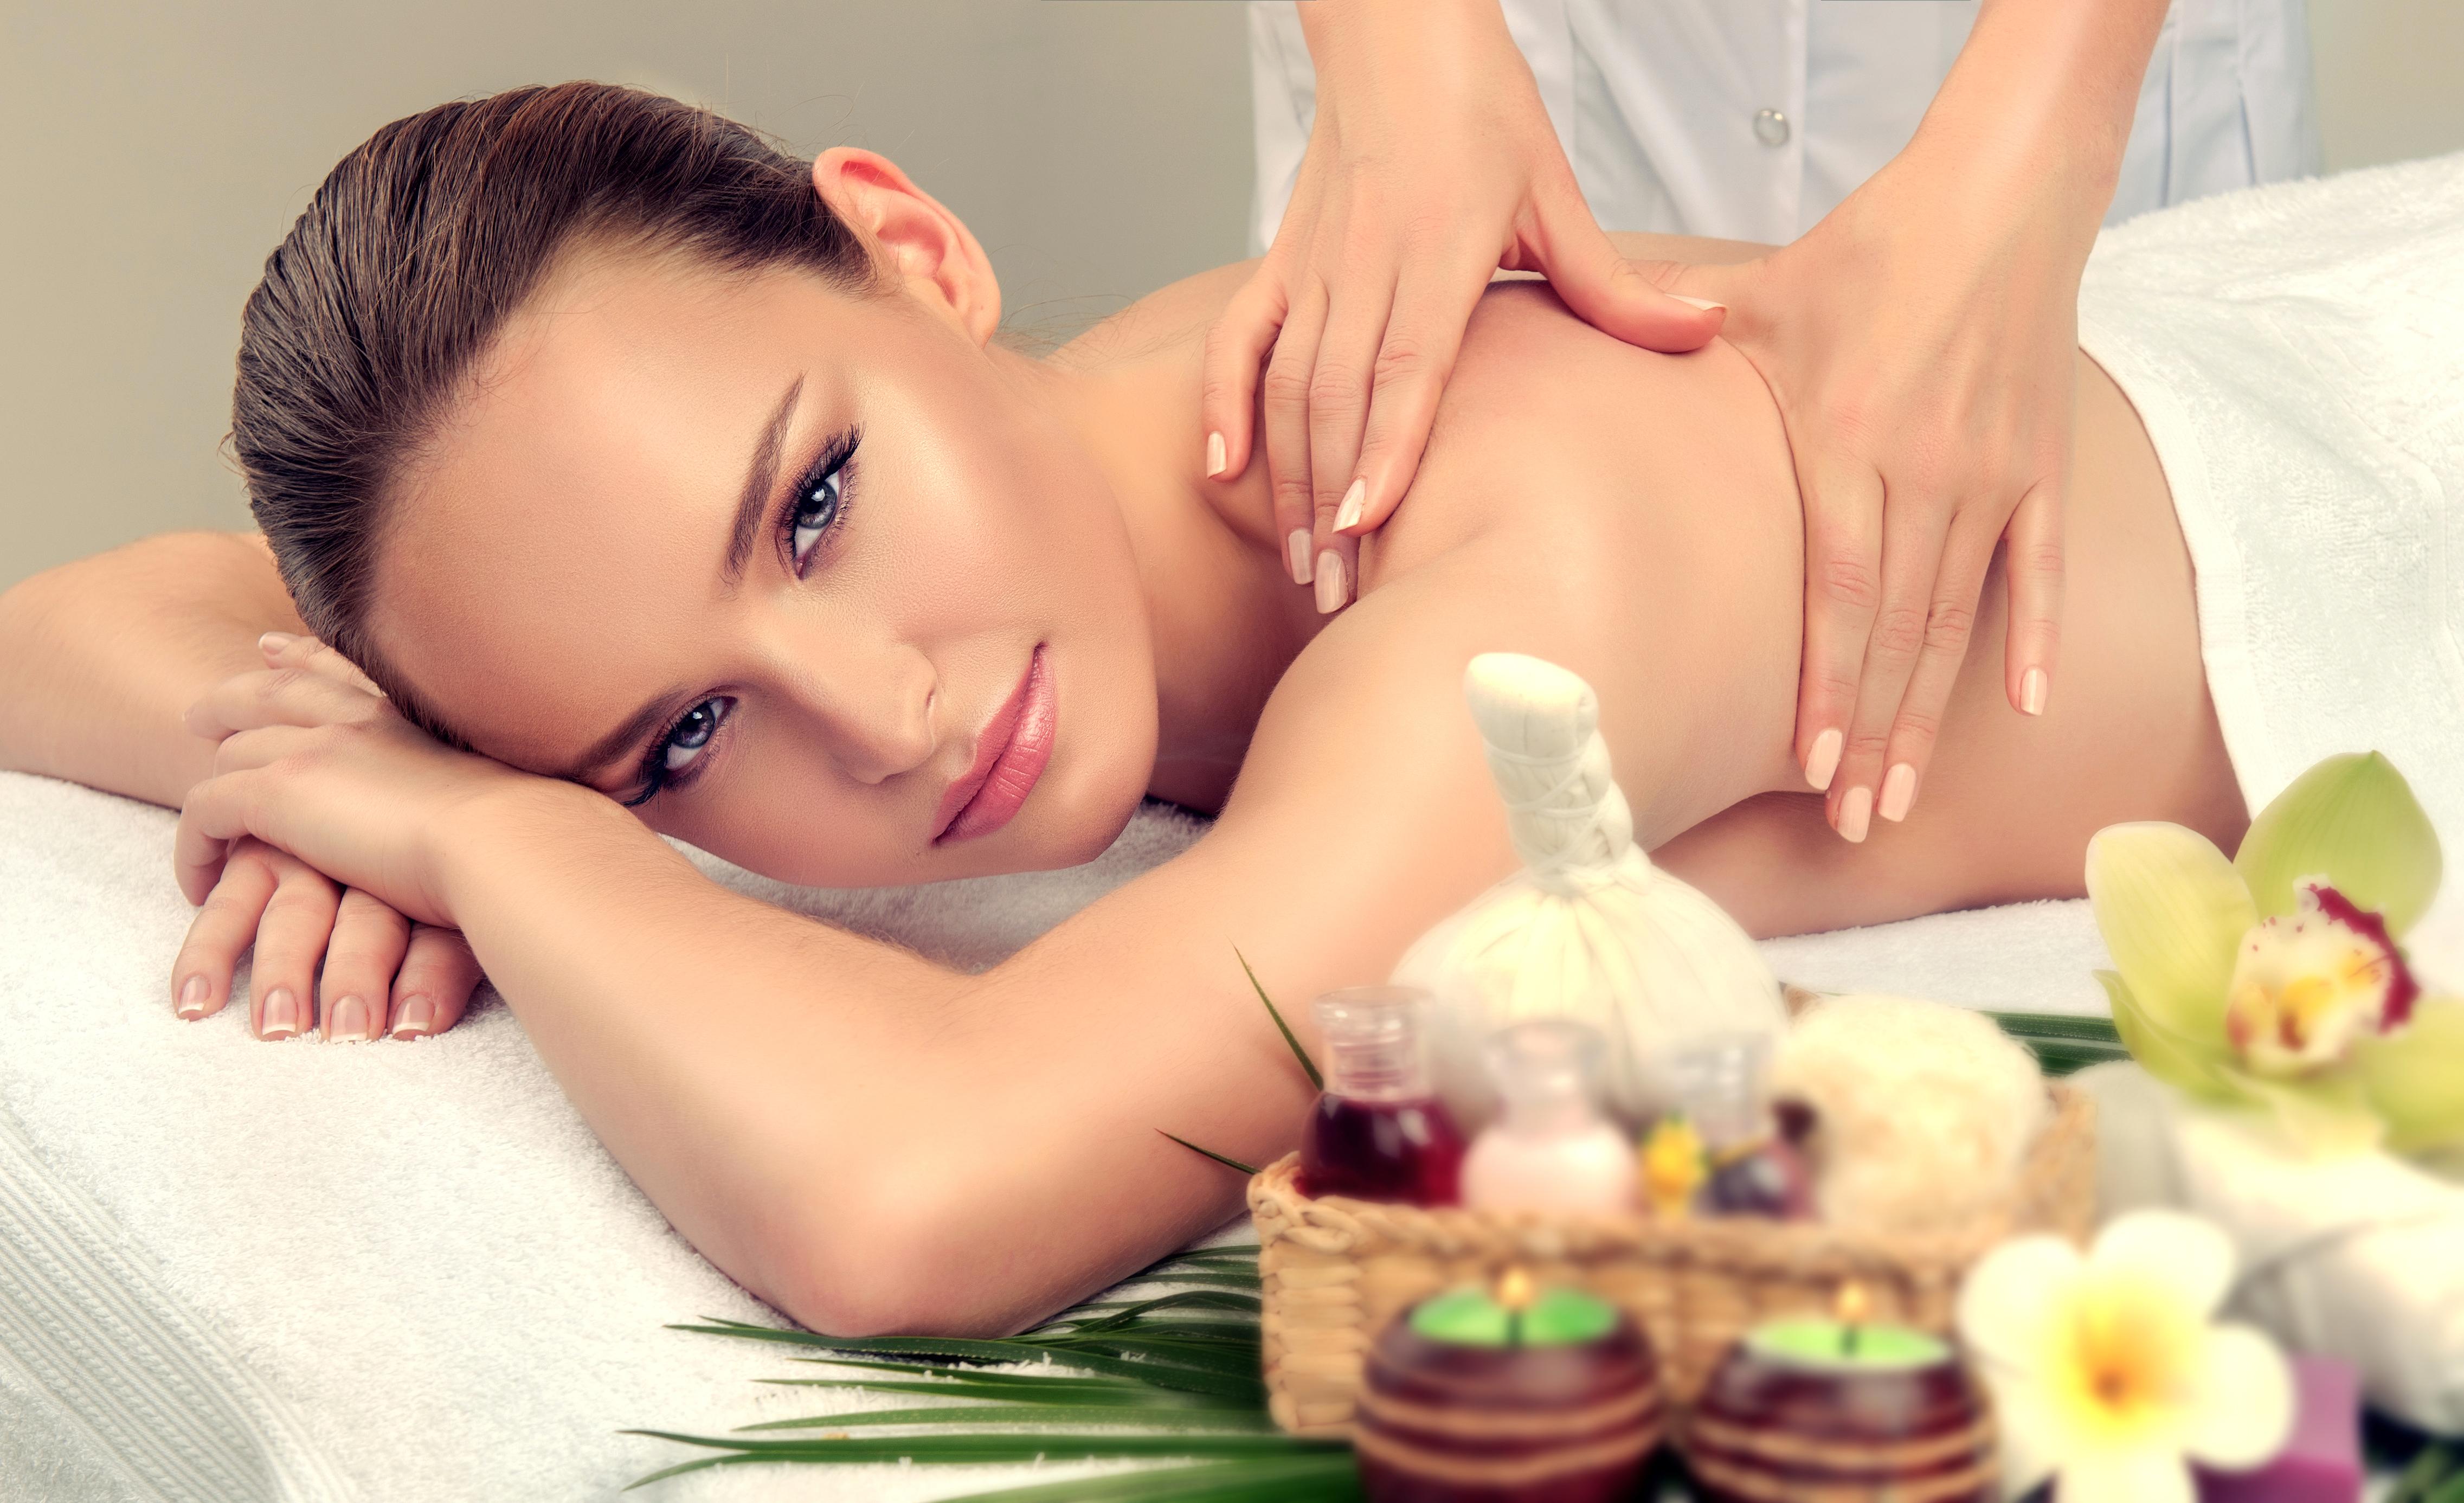 Massage and body ody care. Spa body massage treatment